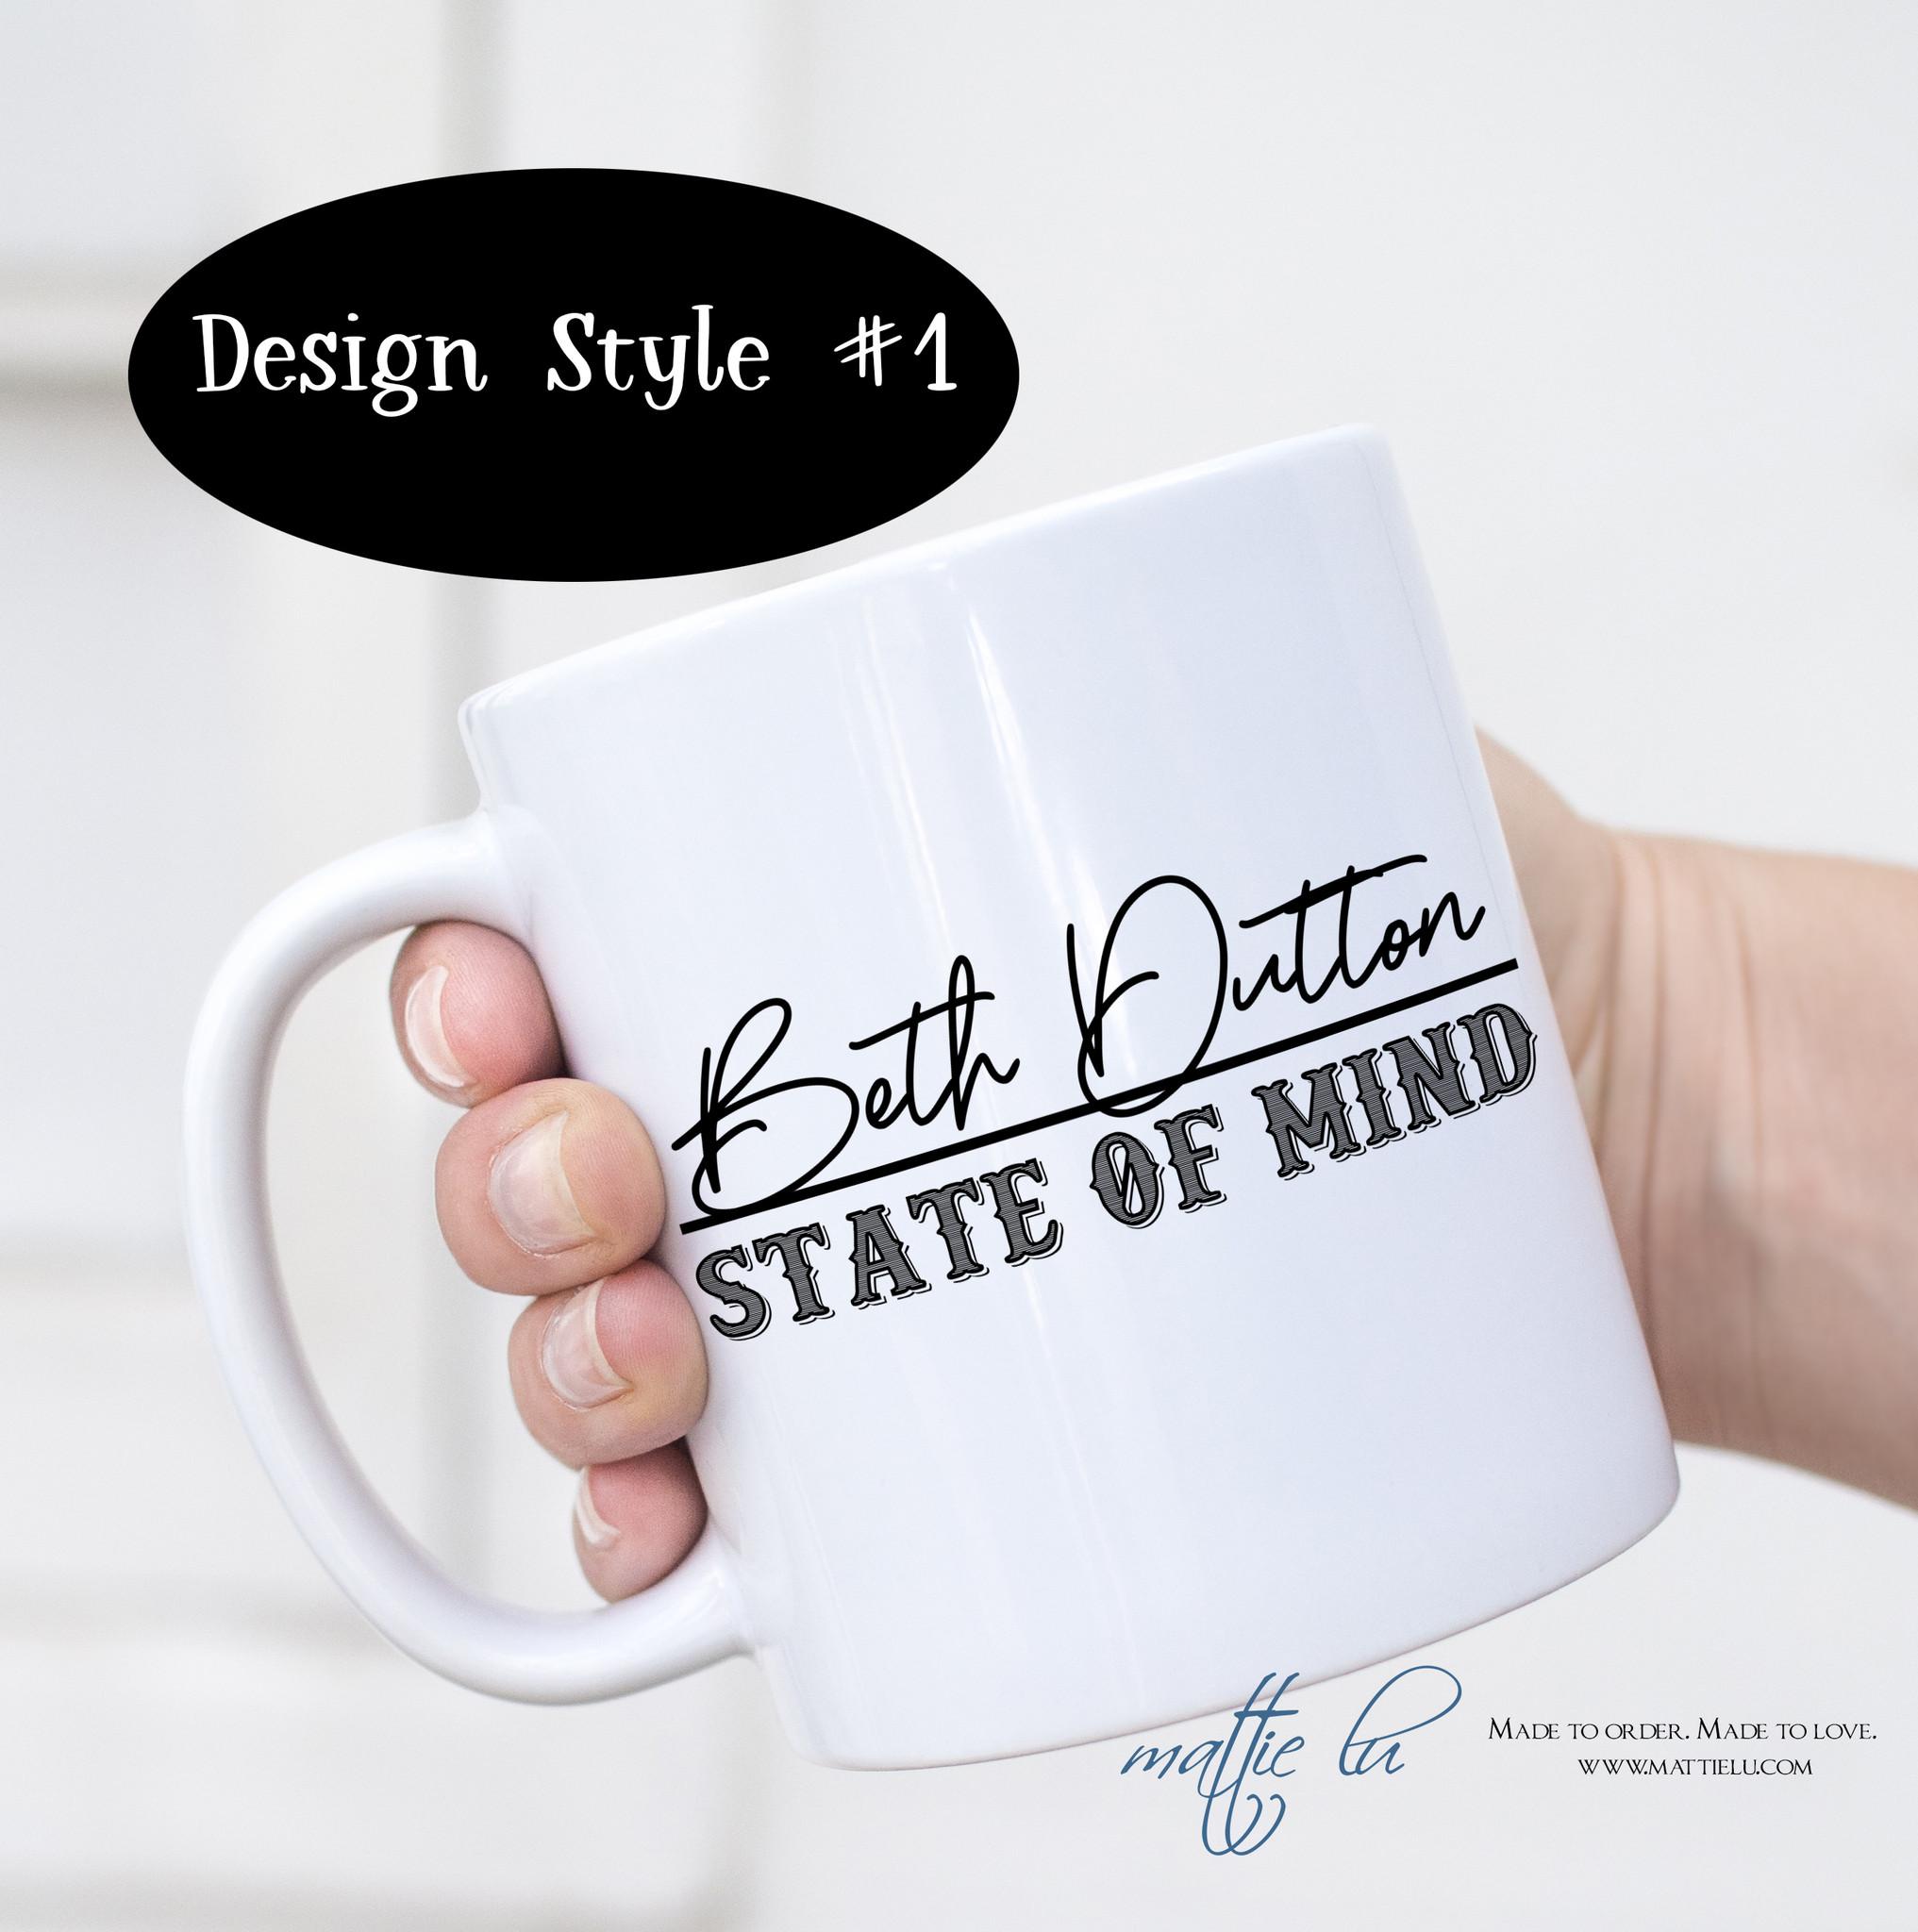 The Mug Coffee >> Beth Dutton State Of Mind Coffee Mug Yellowstone Rustic Coffee Mugs With Sayings Funny Coffee Mugs Coffee Mug Sets Birthday Gift